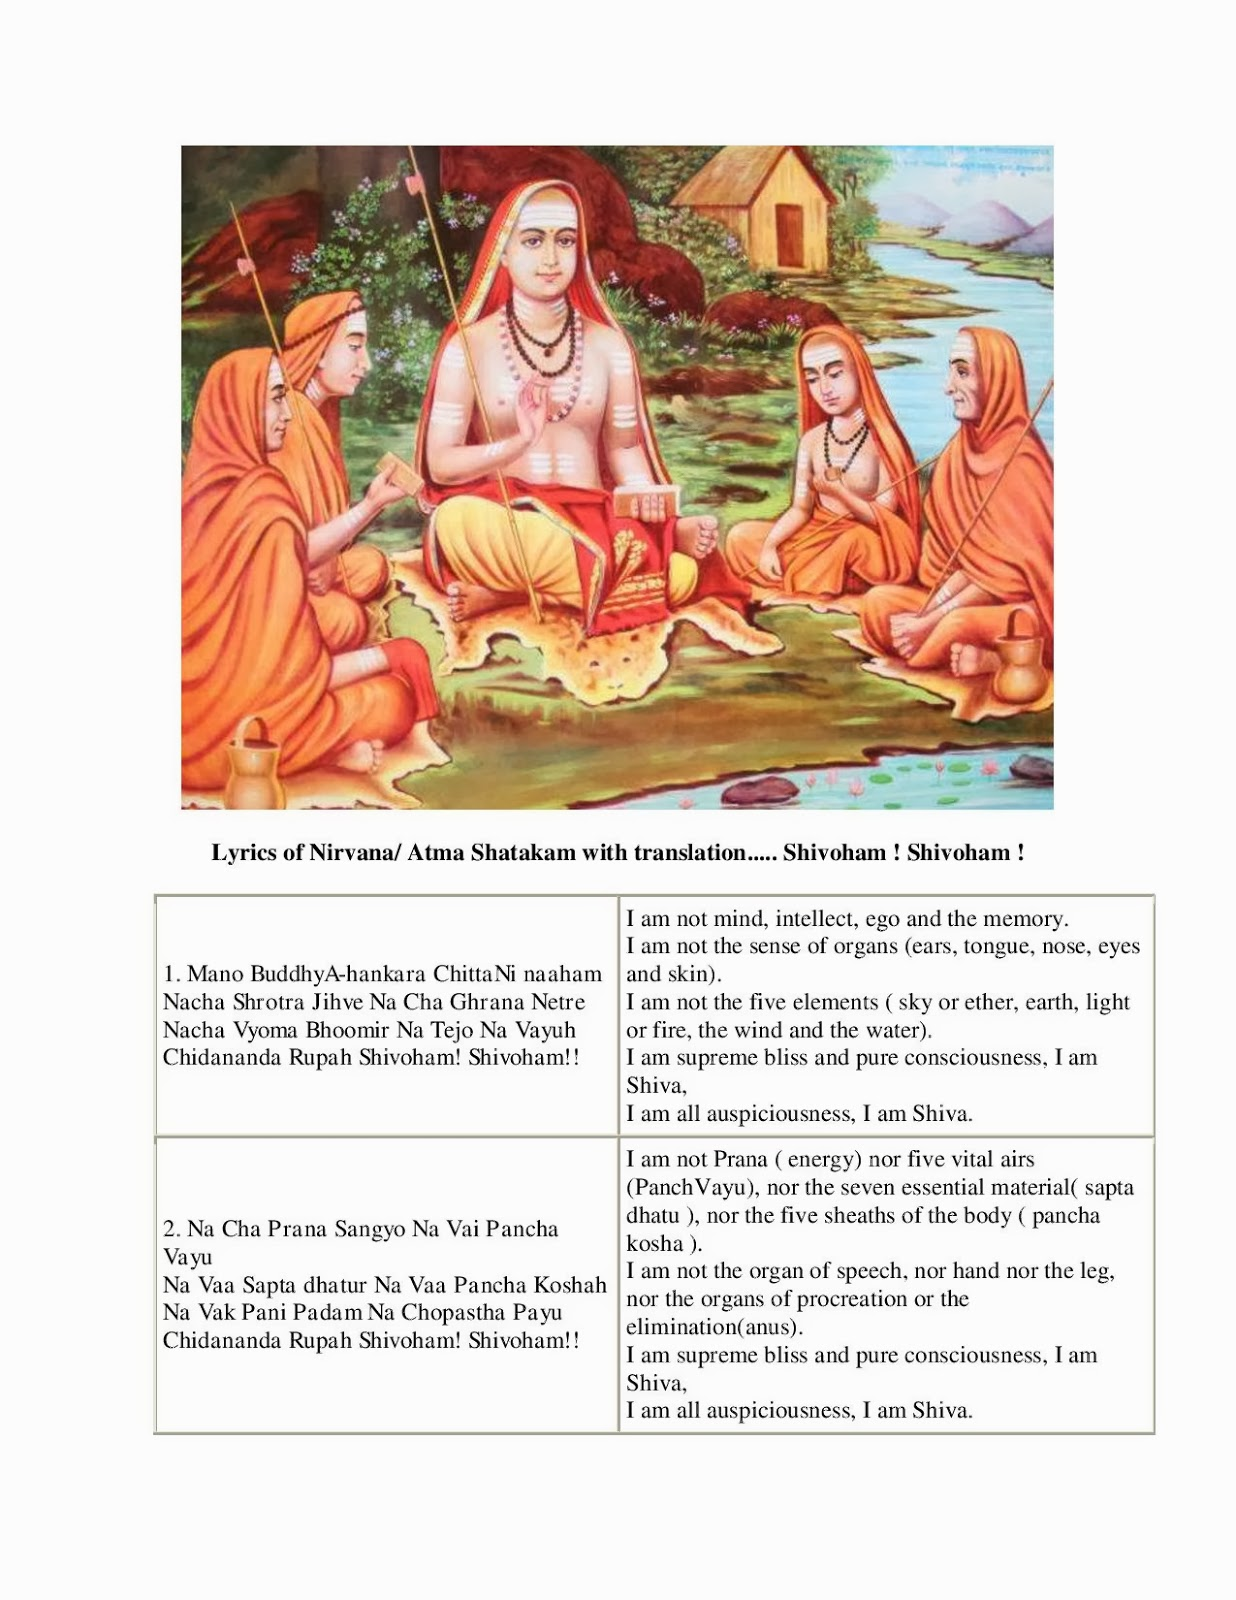 Nirvana Shatakam - In sanskrit with meaning